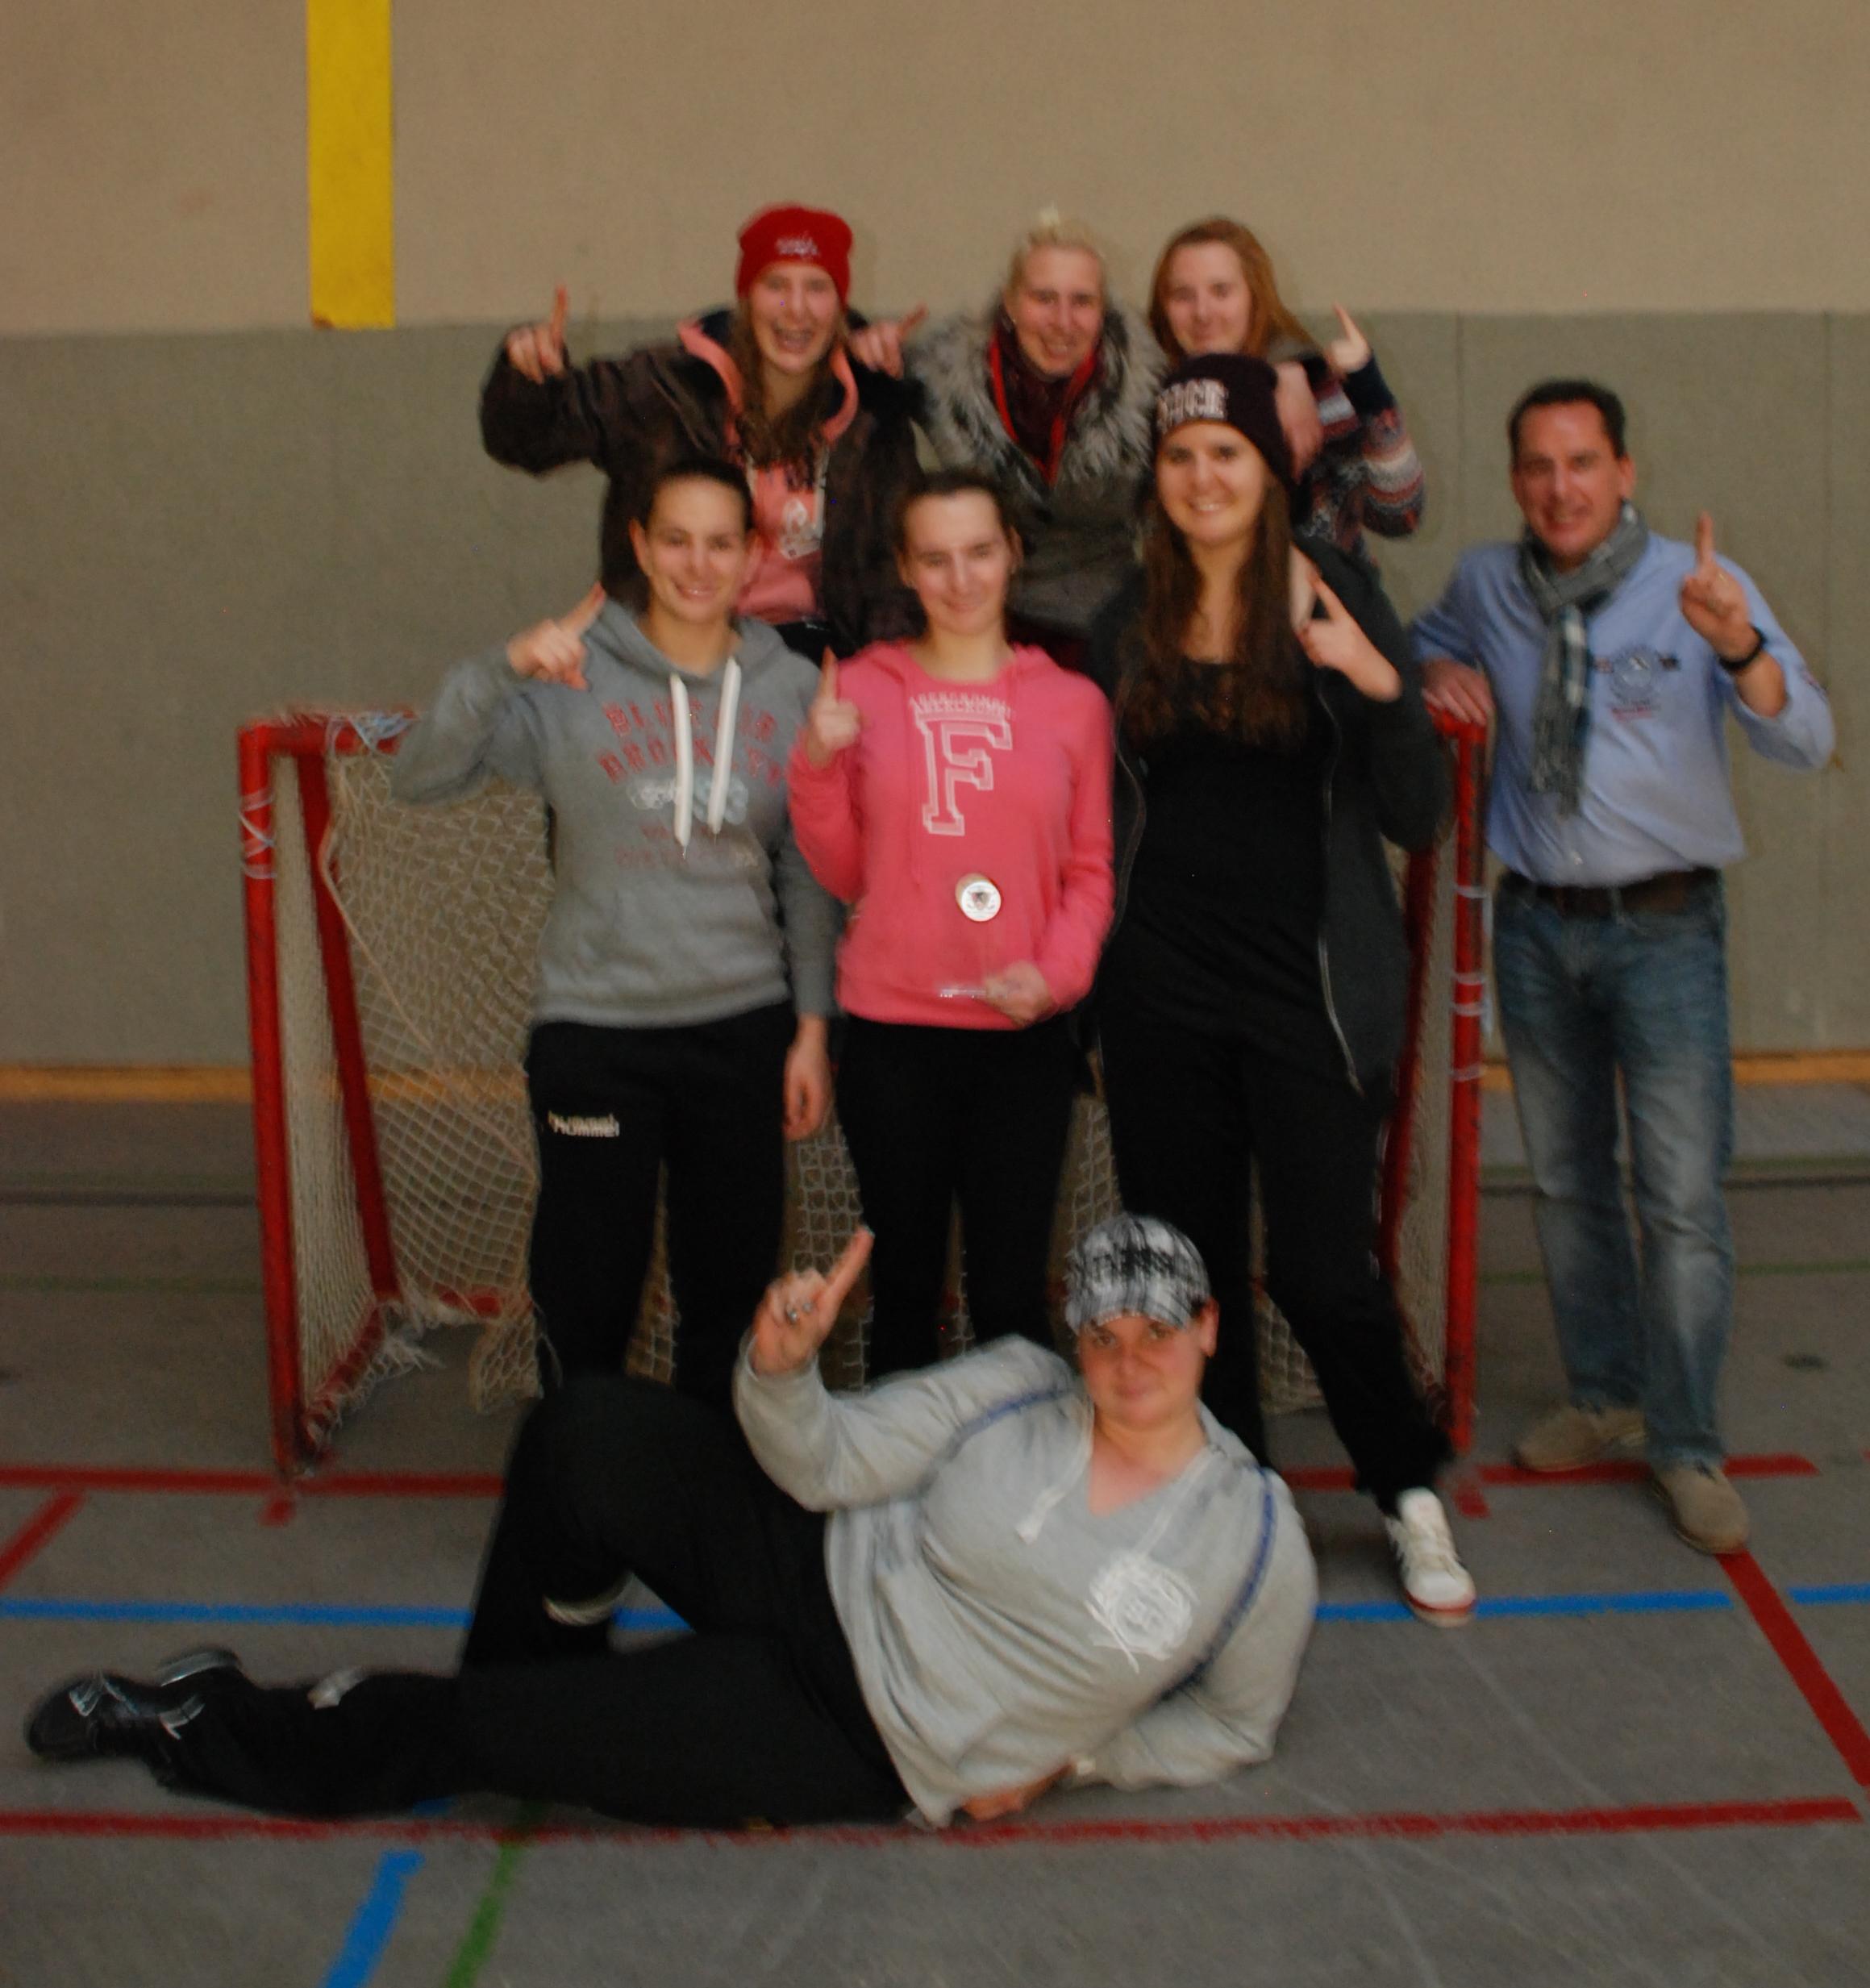 Sieger Euregiopokal 2014 Damen